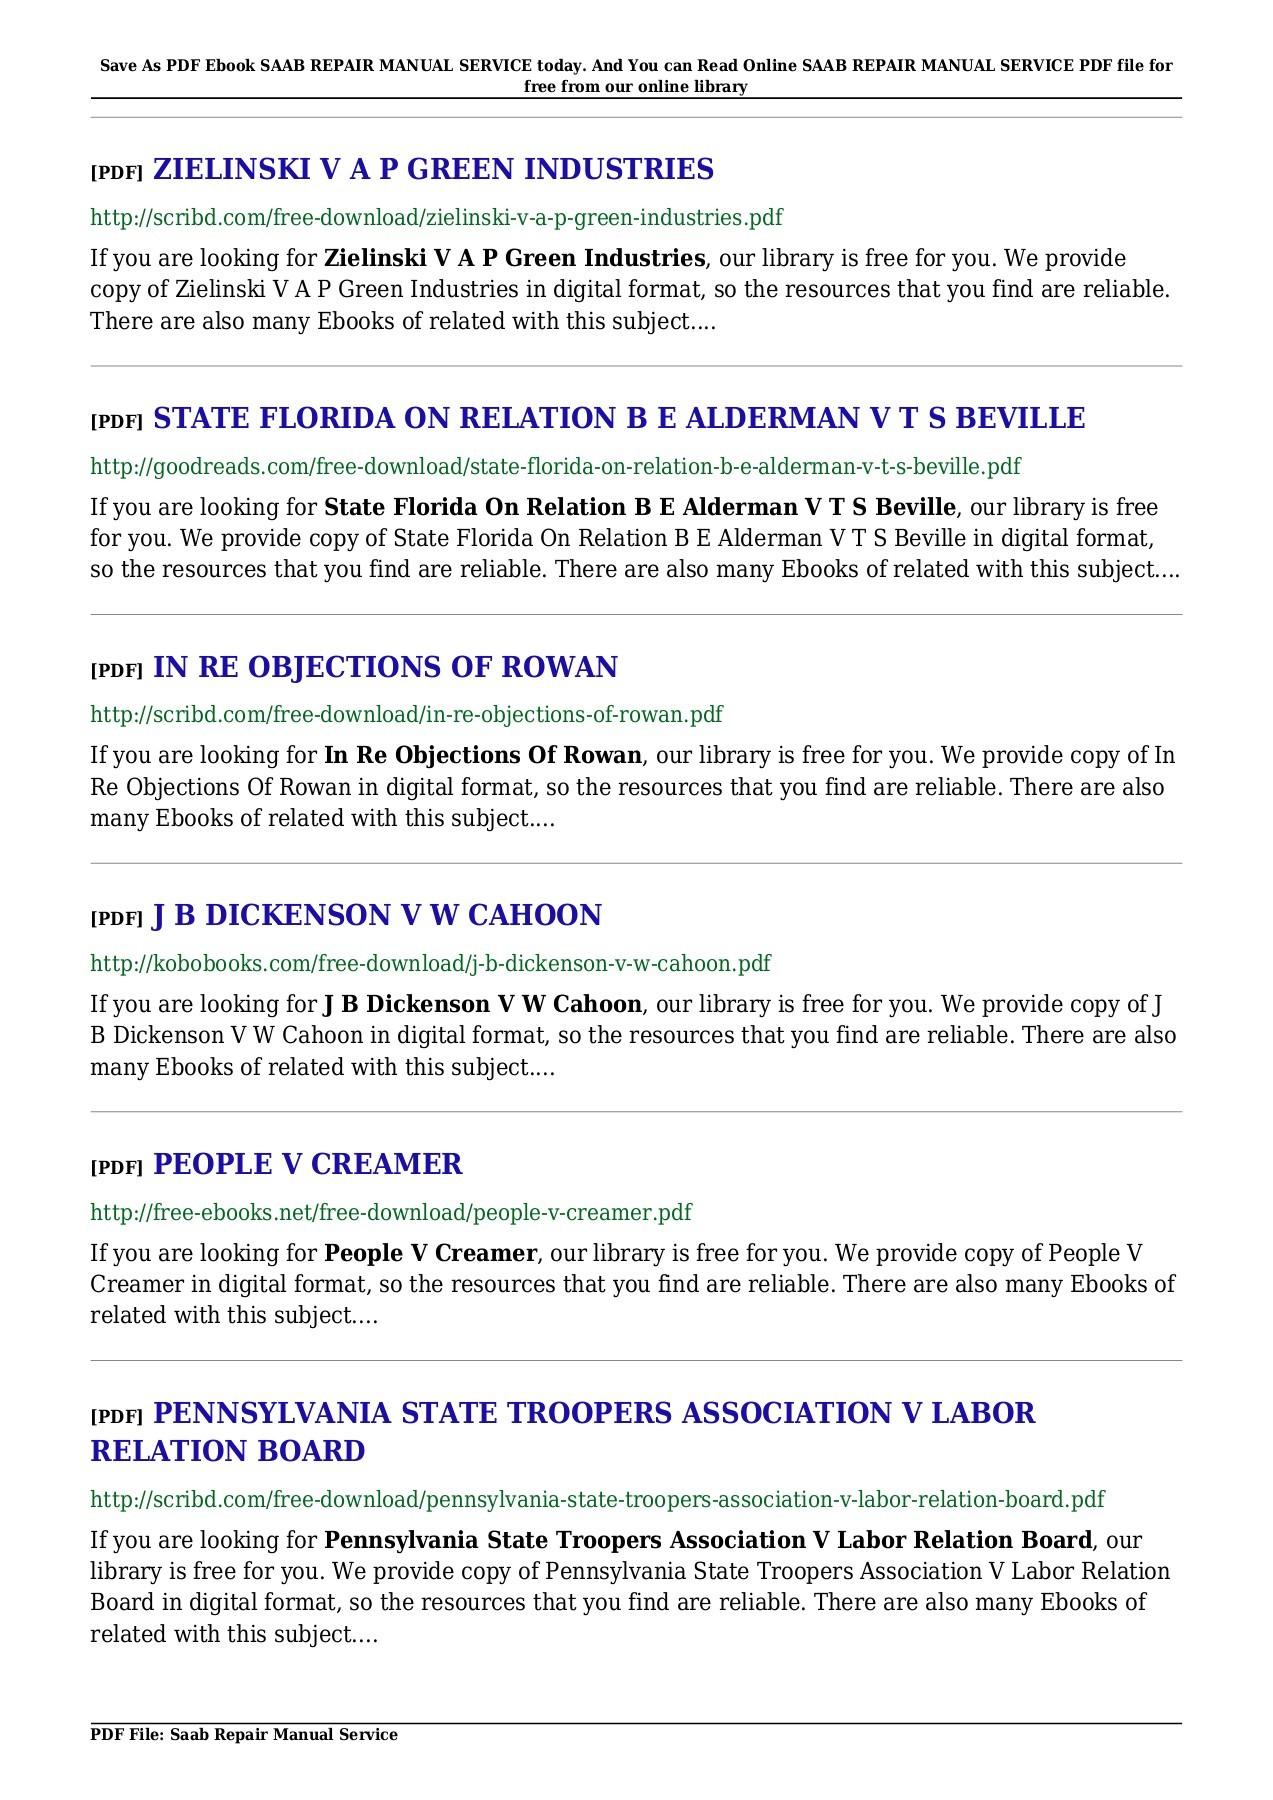 ... Array - angelayu miss acars manual portfolio newspictures www  picturesboss com rh picturesboss com